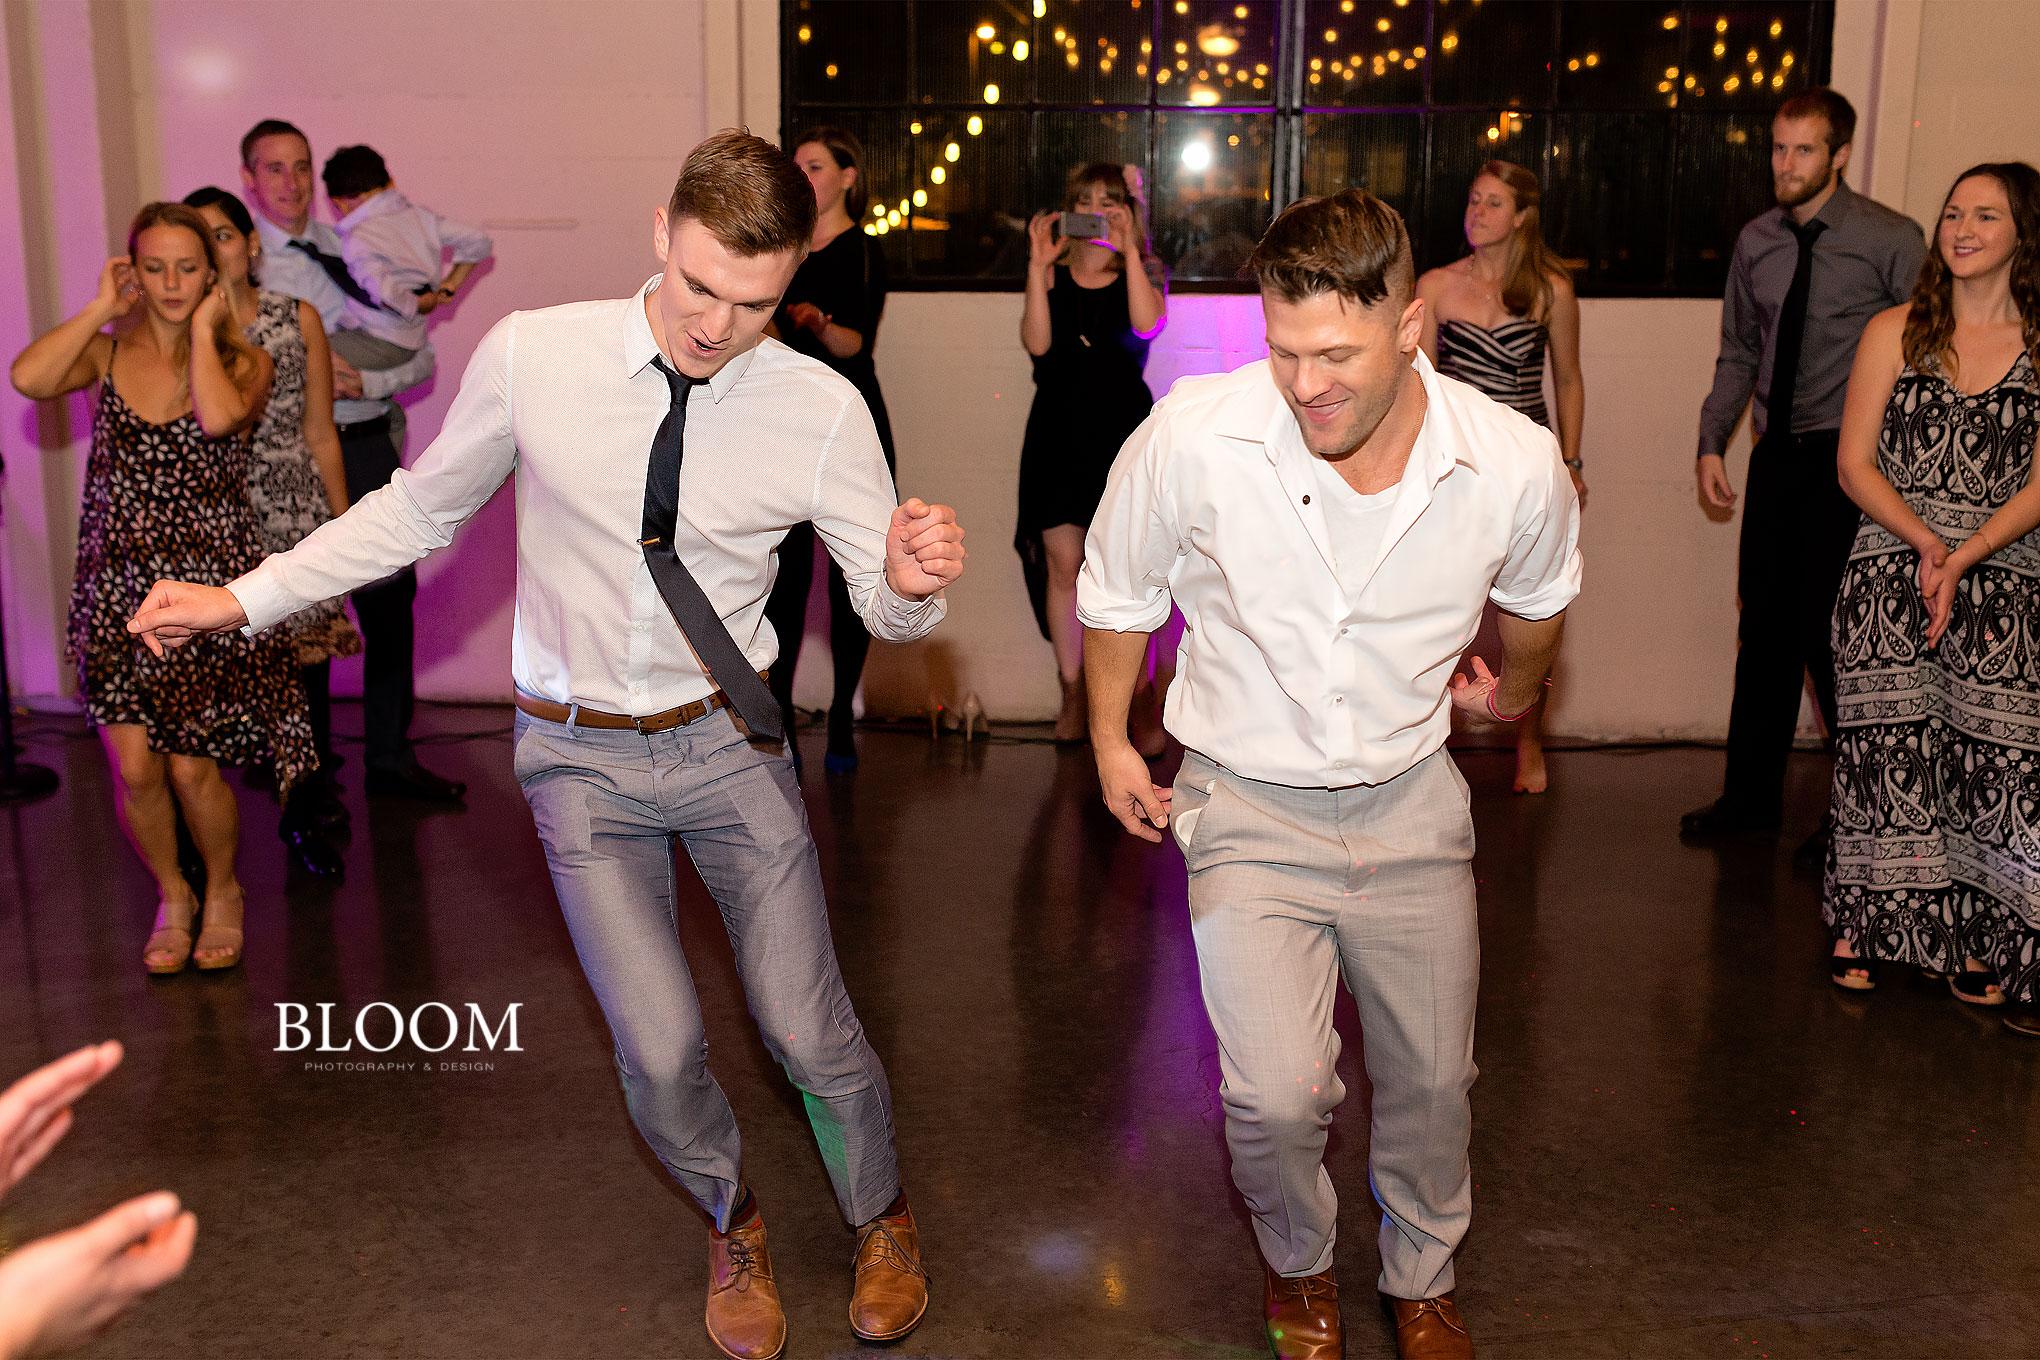 portland_oregon_wedding_photographer_san_antonio_texas_bloom_231016_NMM_7624.jpg